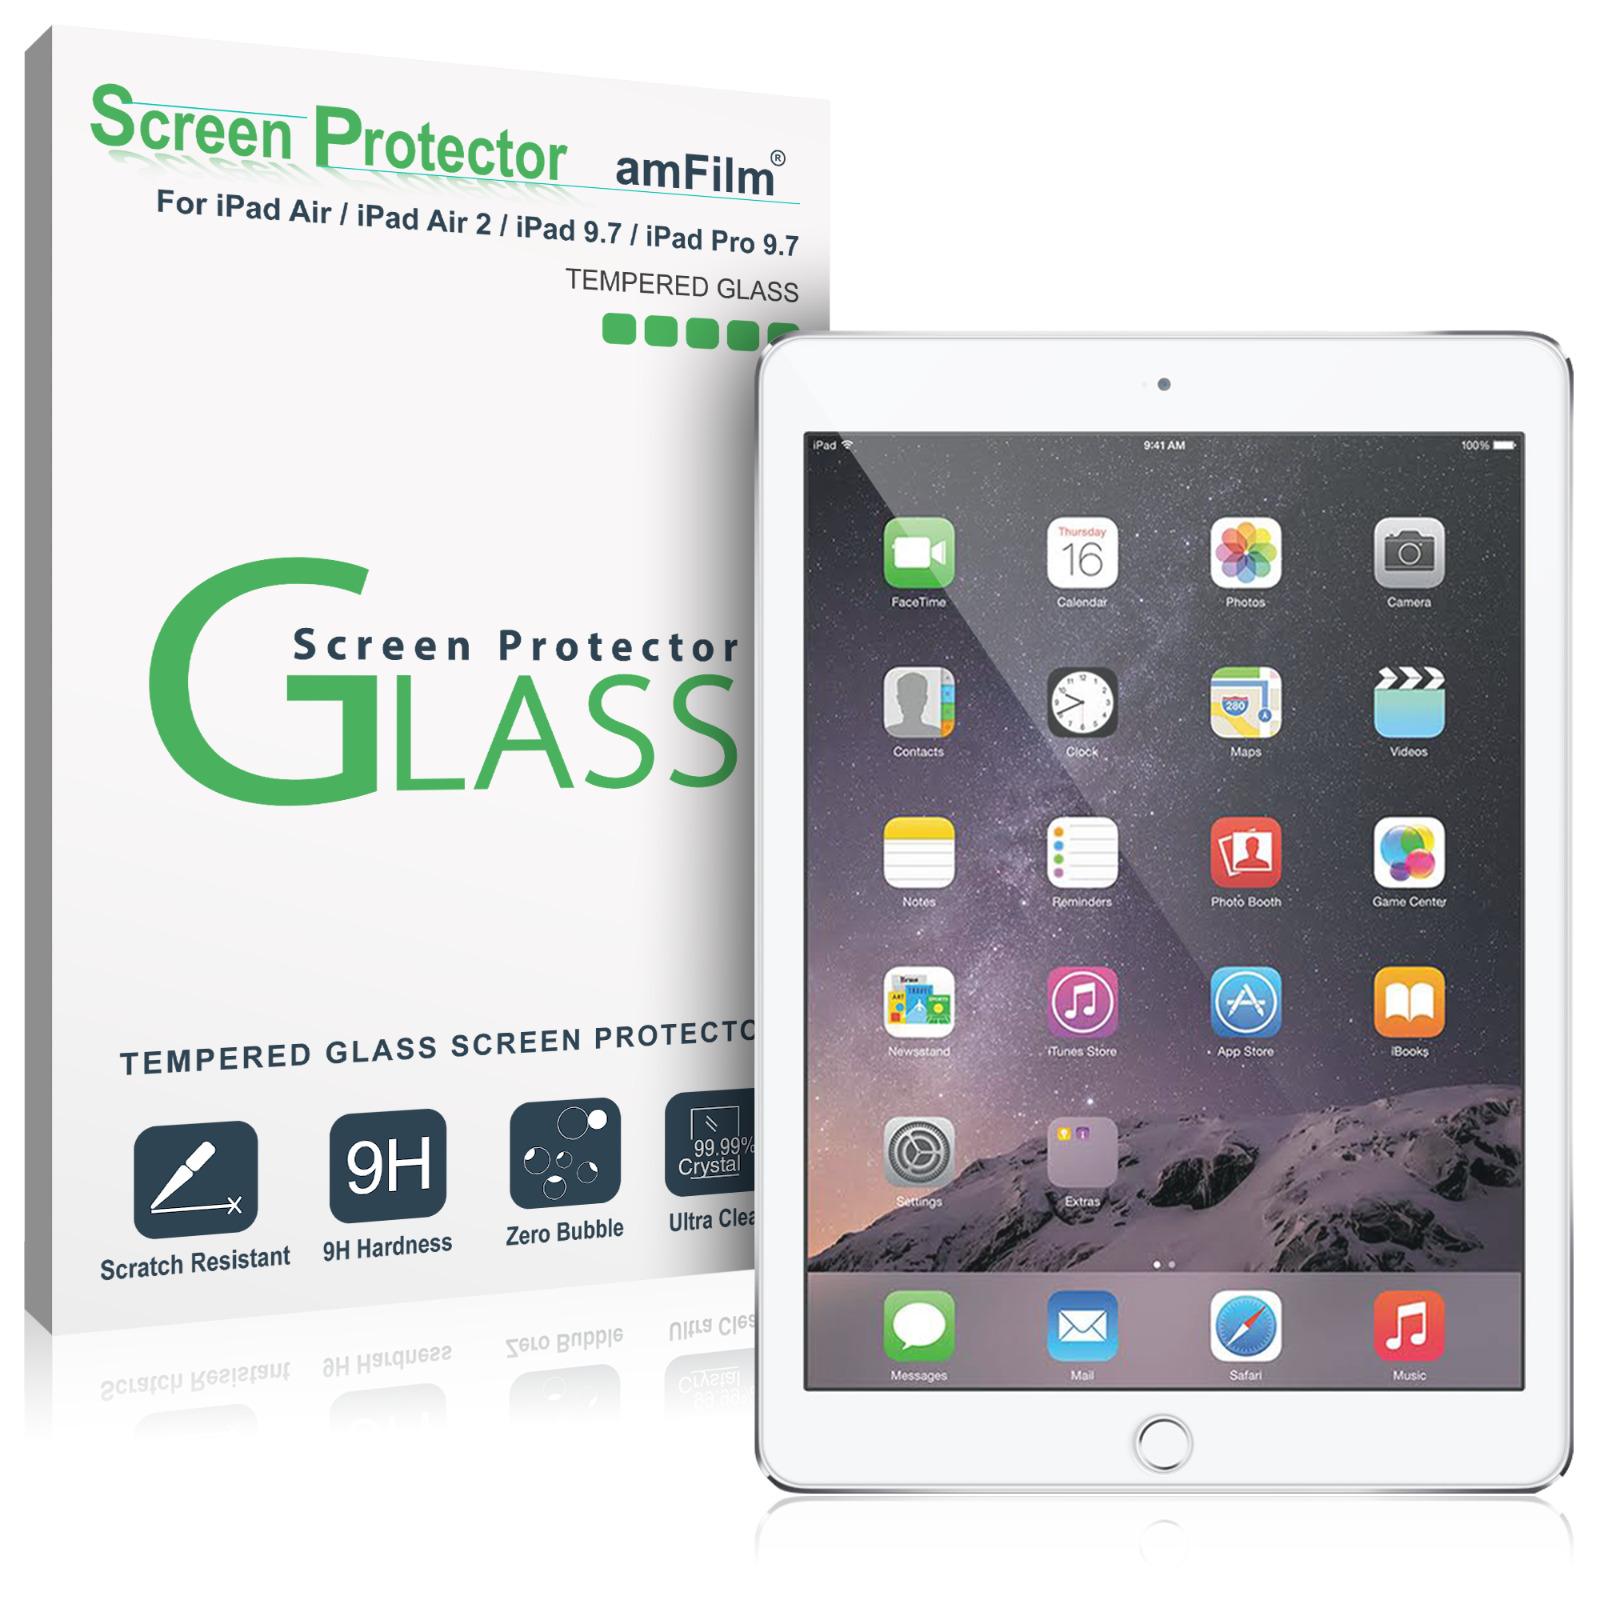 8 99 Ipad 9 7 Pro 9 7 Air Air 2 Amfilm Tempered Glass Screen Protector 1 Pack Ebay Electronics Ipad Air 2 Ipad Air Ipad Pro